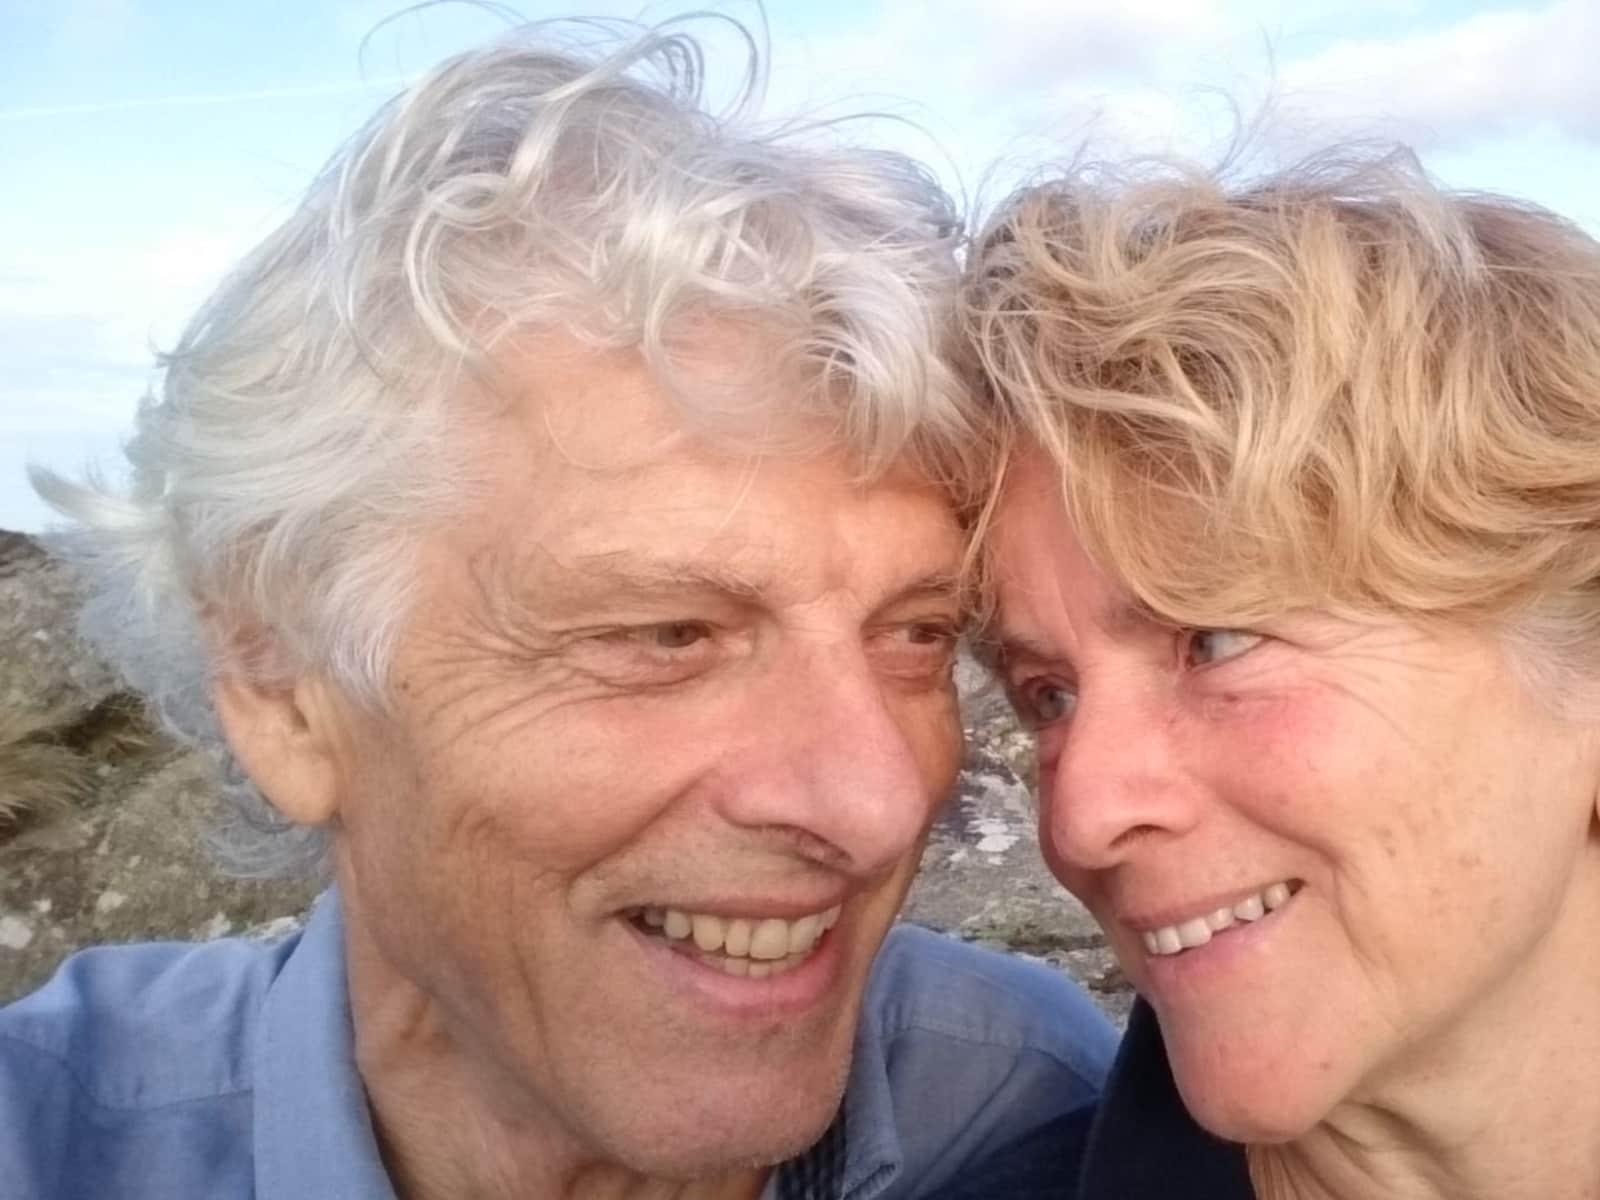 Ewan & Melanie from Kekerdom, Netherlands